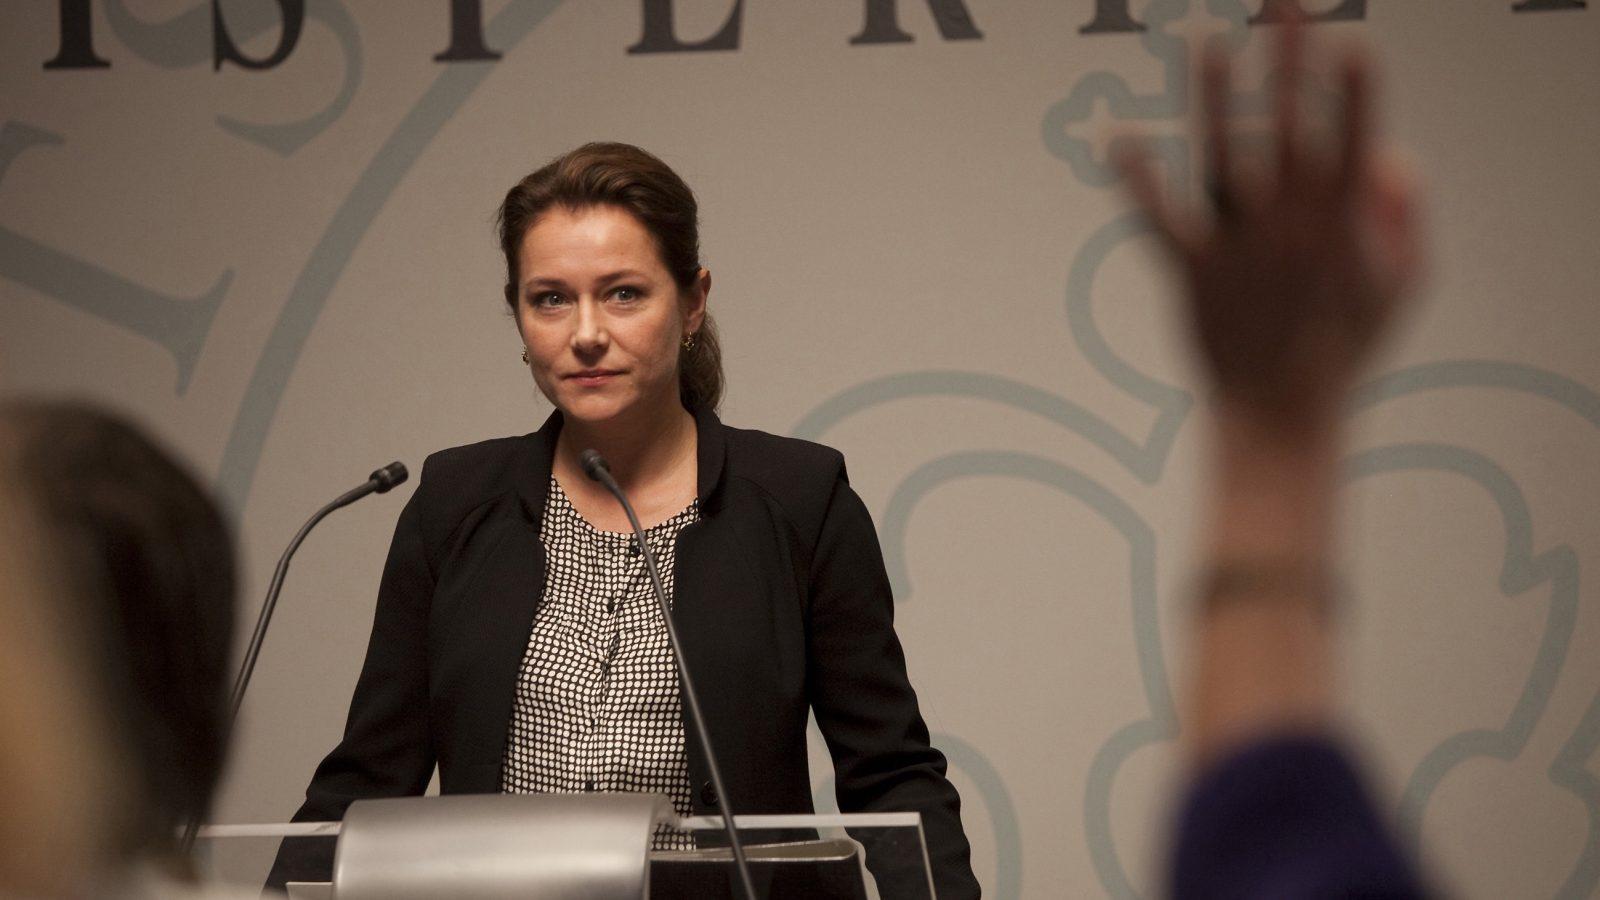 Sidse Babett Knudsen as the Danish PM in Borgen.